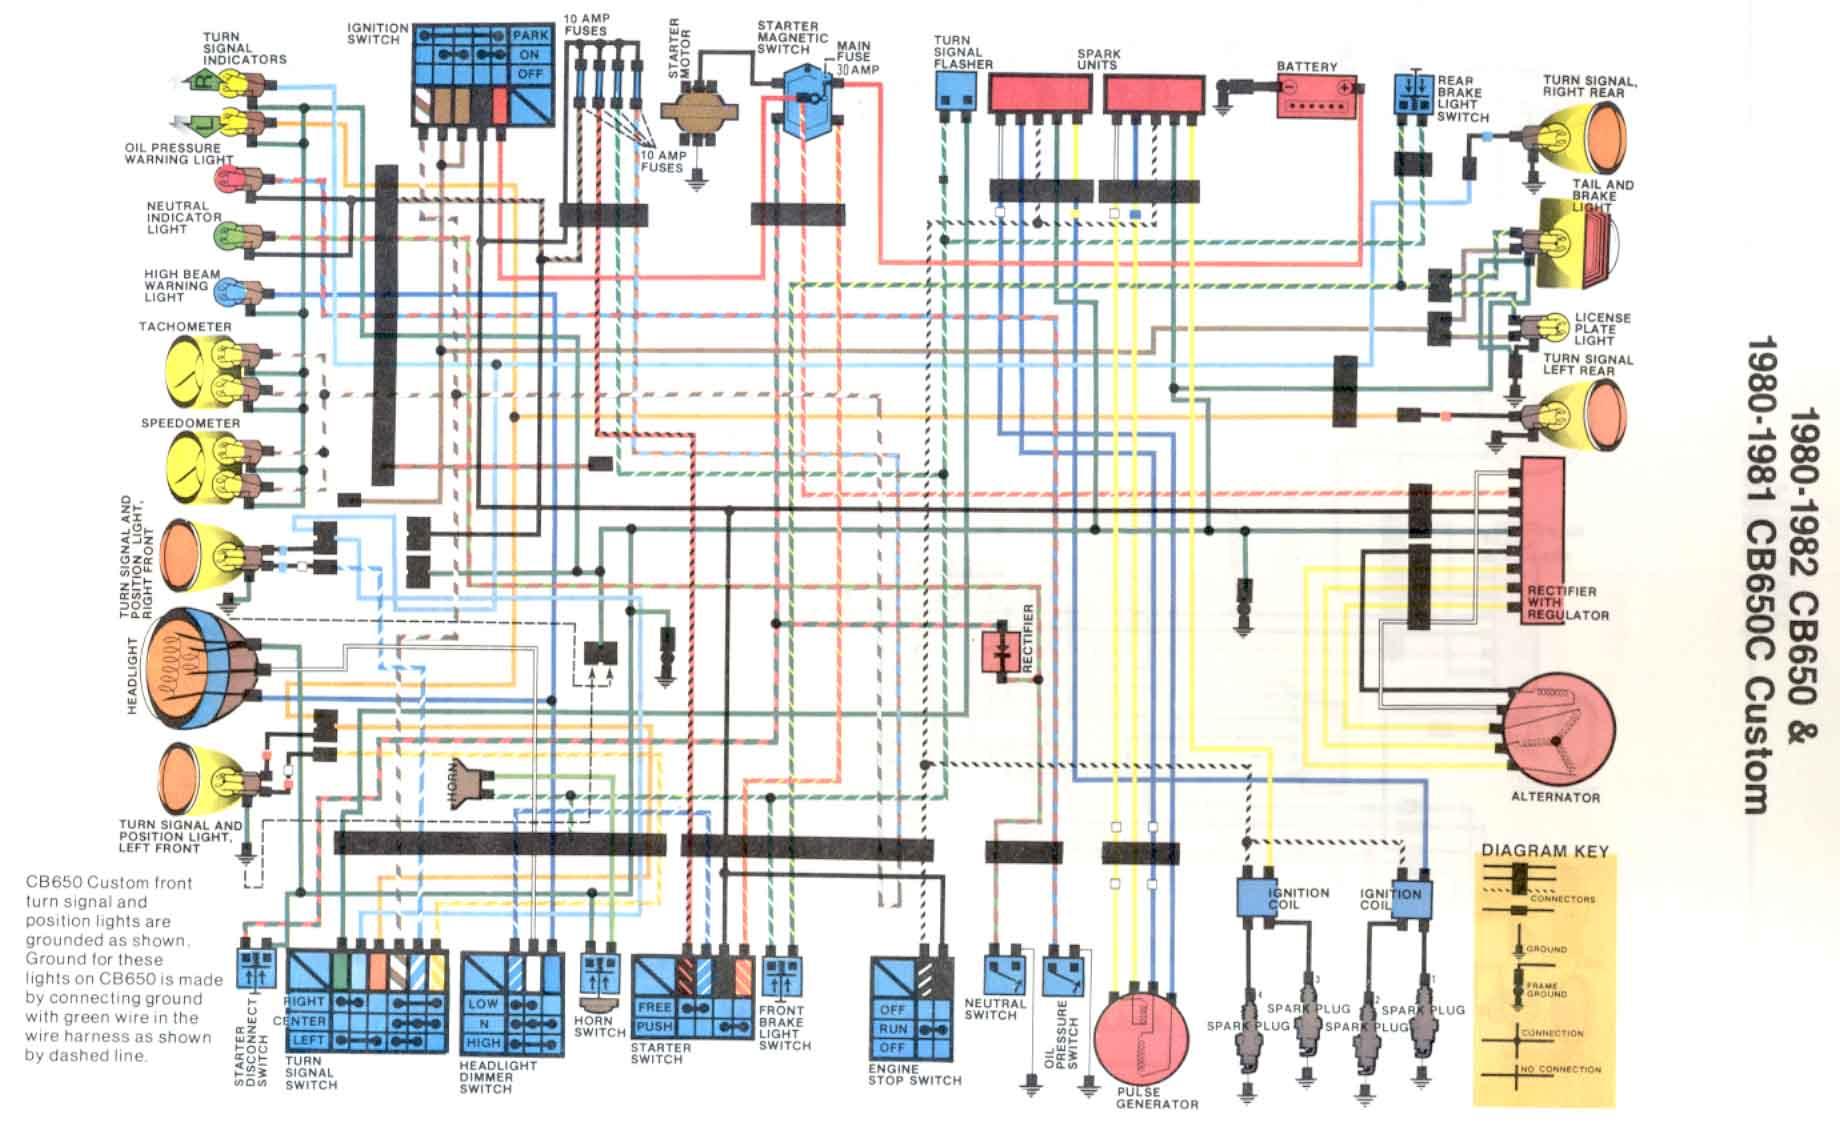 WRG-5771] 82 Kz1000 Wiring Diagram on kz1300 wiring diagram, kawasaki wiring diagram, klr650 wiring diagram, xs650 wiring diagram, kl600 wiring diagram, kz440 wiring diagram, yamaha wiring diagram, cb750 wiring diagram, cb750k wiring diagram, suzuki wiring diagram, gs400 wiring diagram, ninja 250r wiring diagram, zx12 wiring diagram, motorcycle electronic ignition wiring diagram, kz650 wiring diagram, zx1000 wiring diagram, klr250 wiring diagram, zx10 wiring diagram, ex250 wiring diagram, cat 5 wiring diagram,